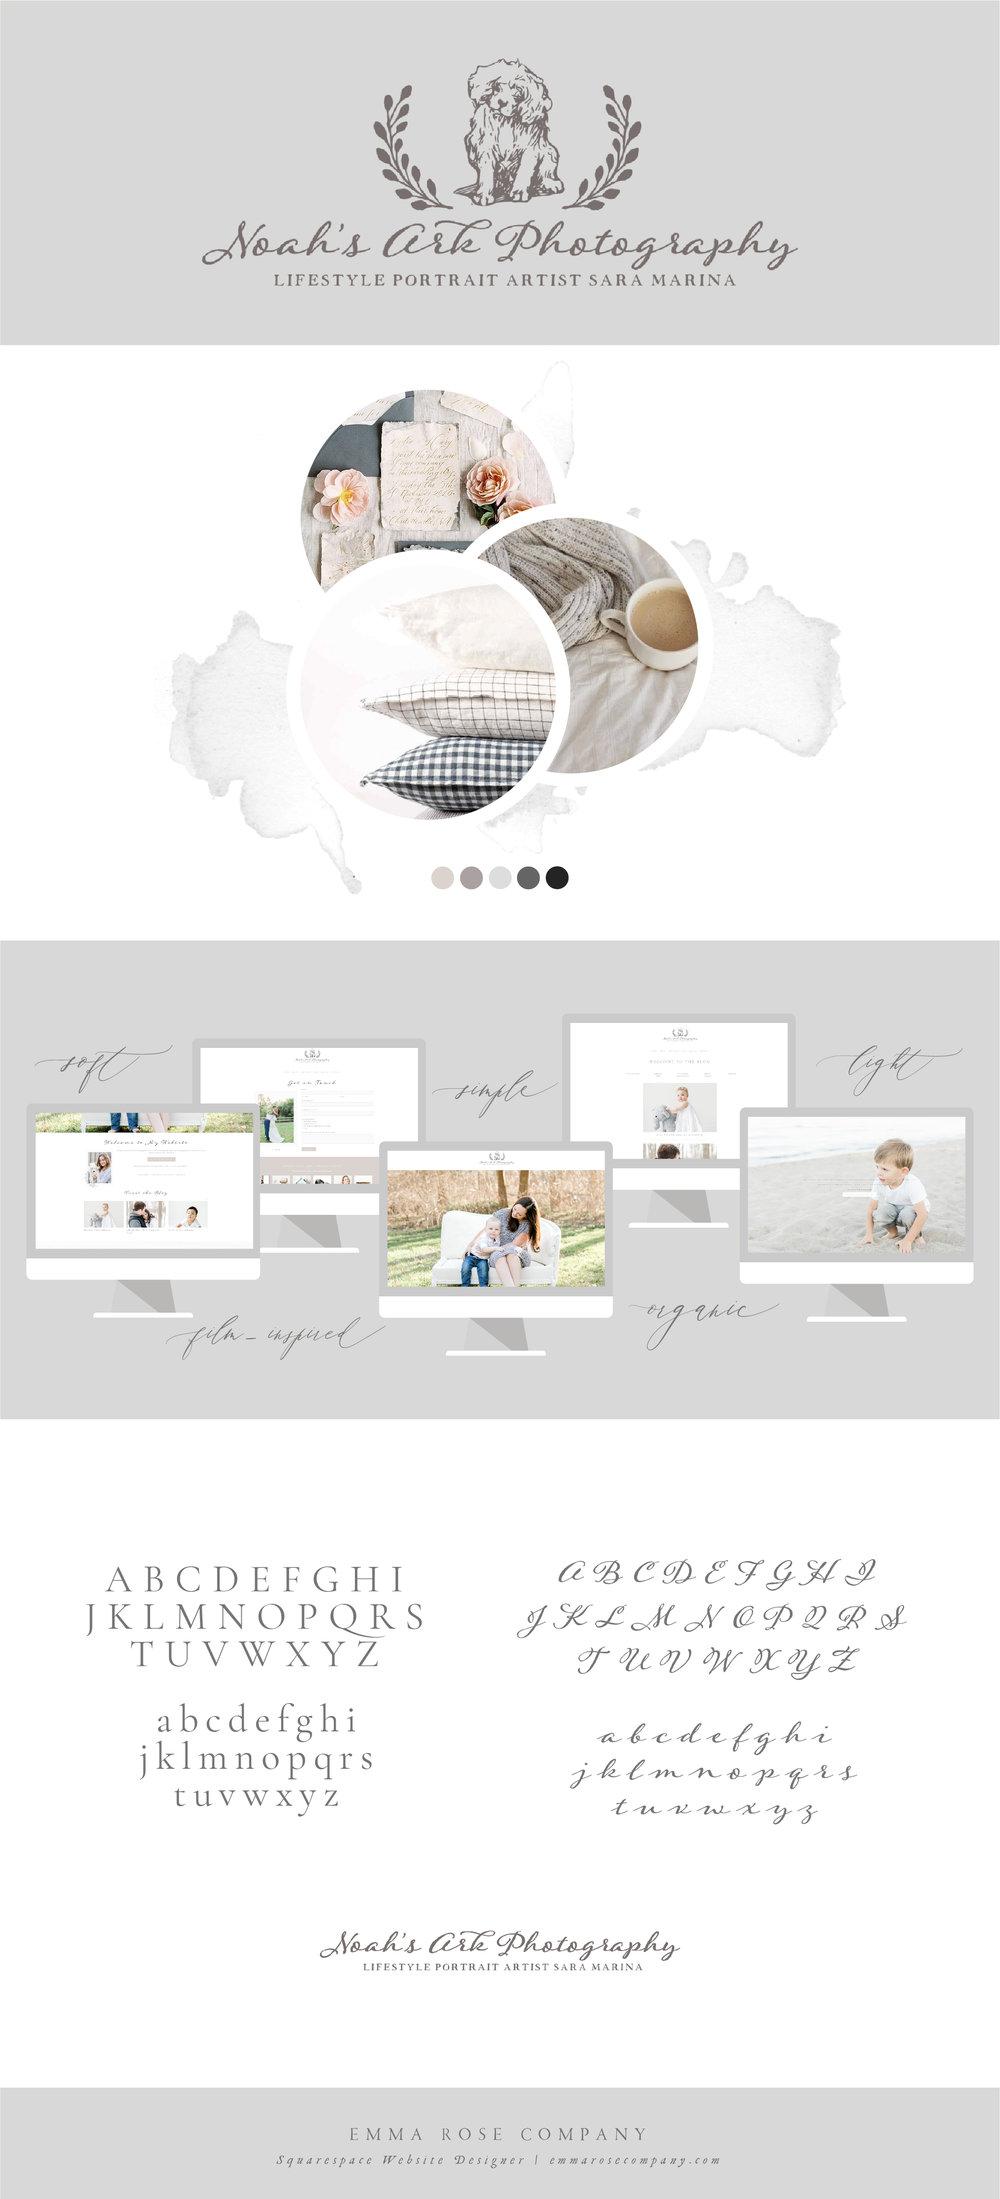 Noah's Ark Photography | ERC Project Showcase | Branding Board Inspiration | Squarespace Website Designer for Photographers